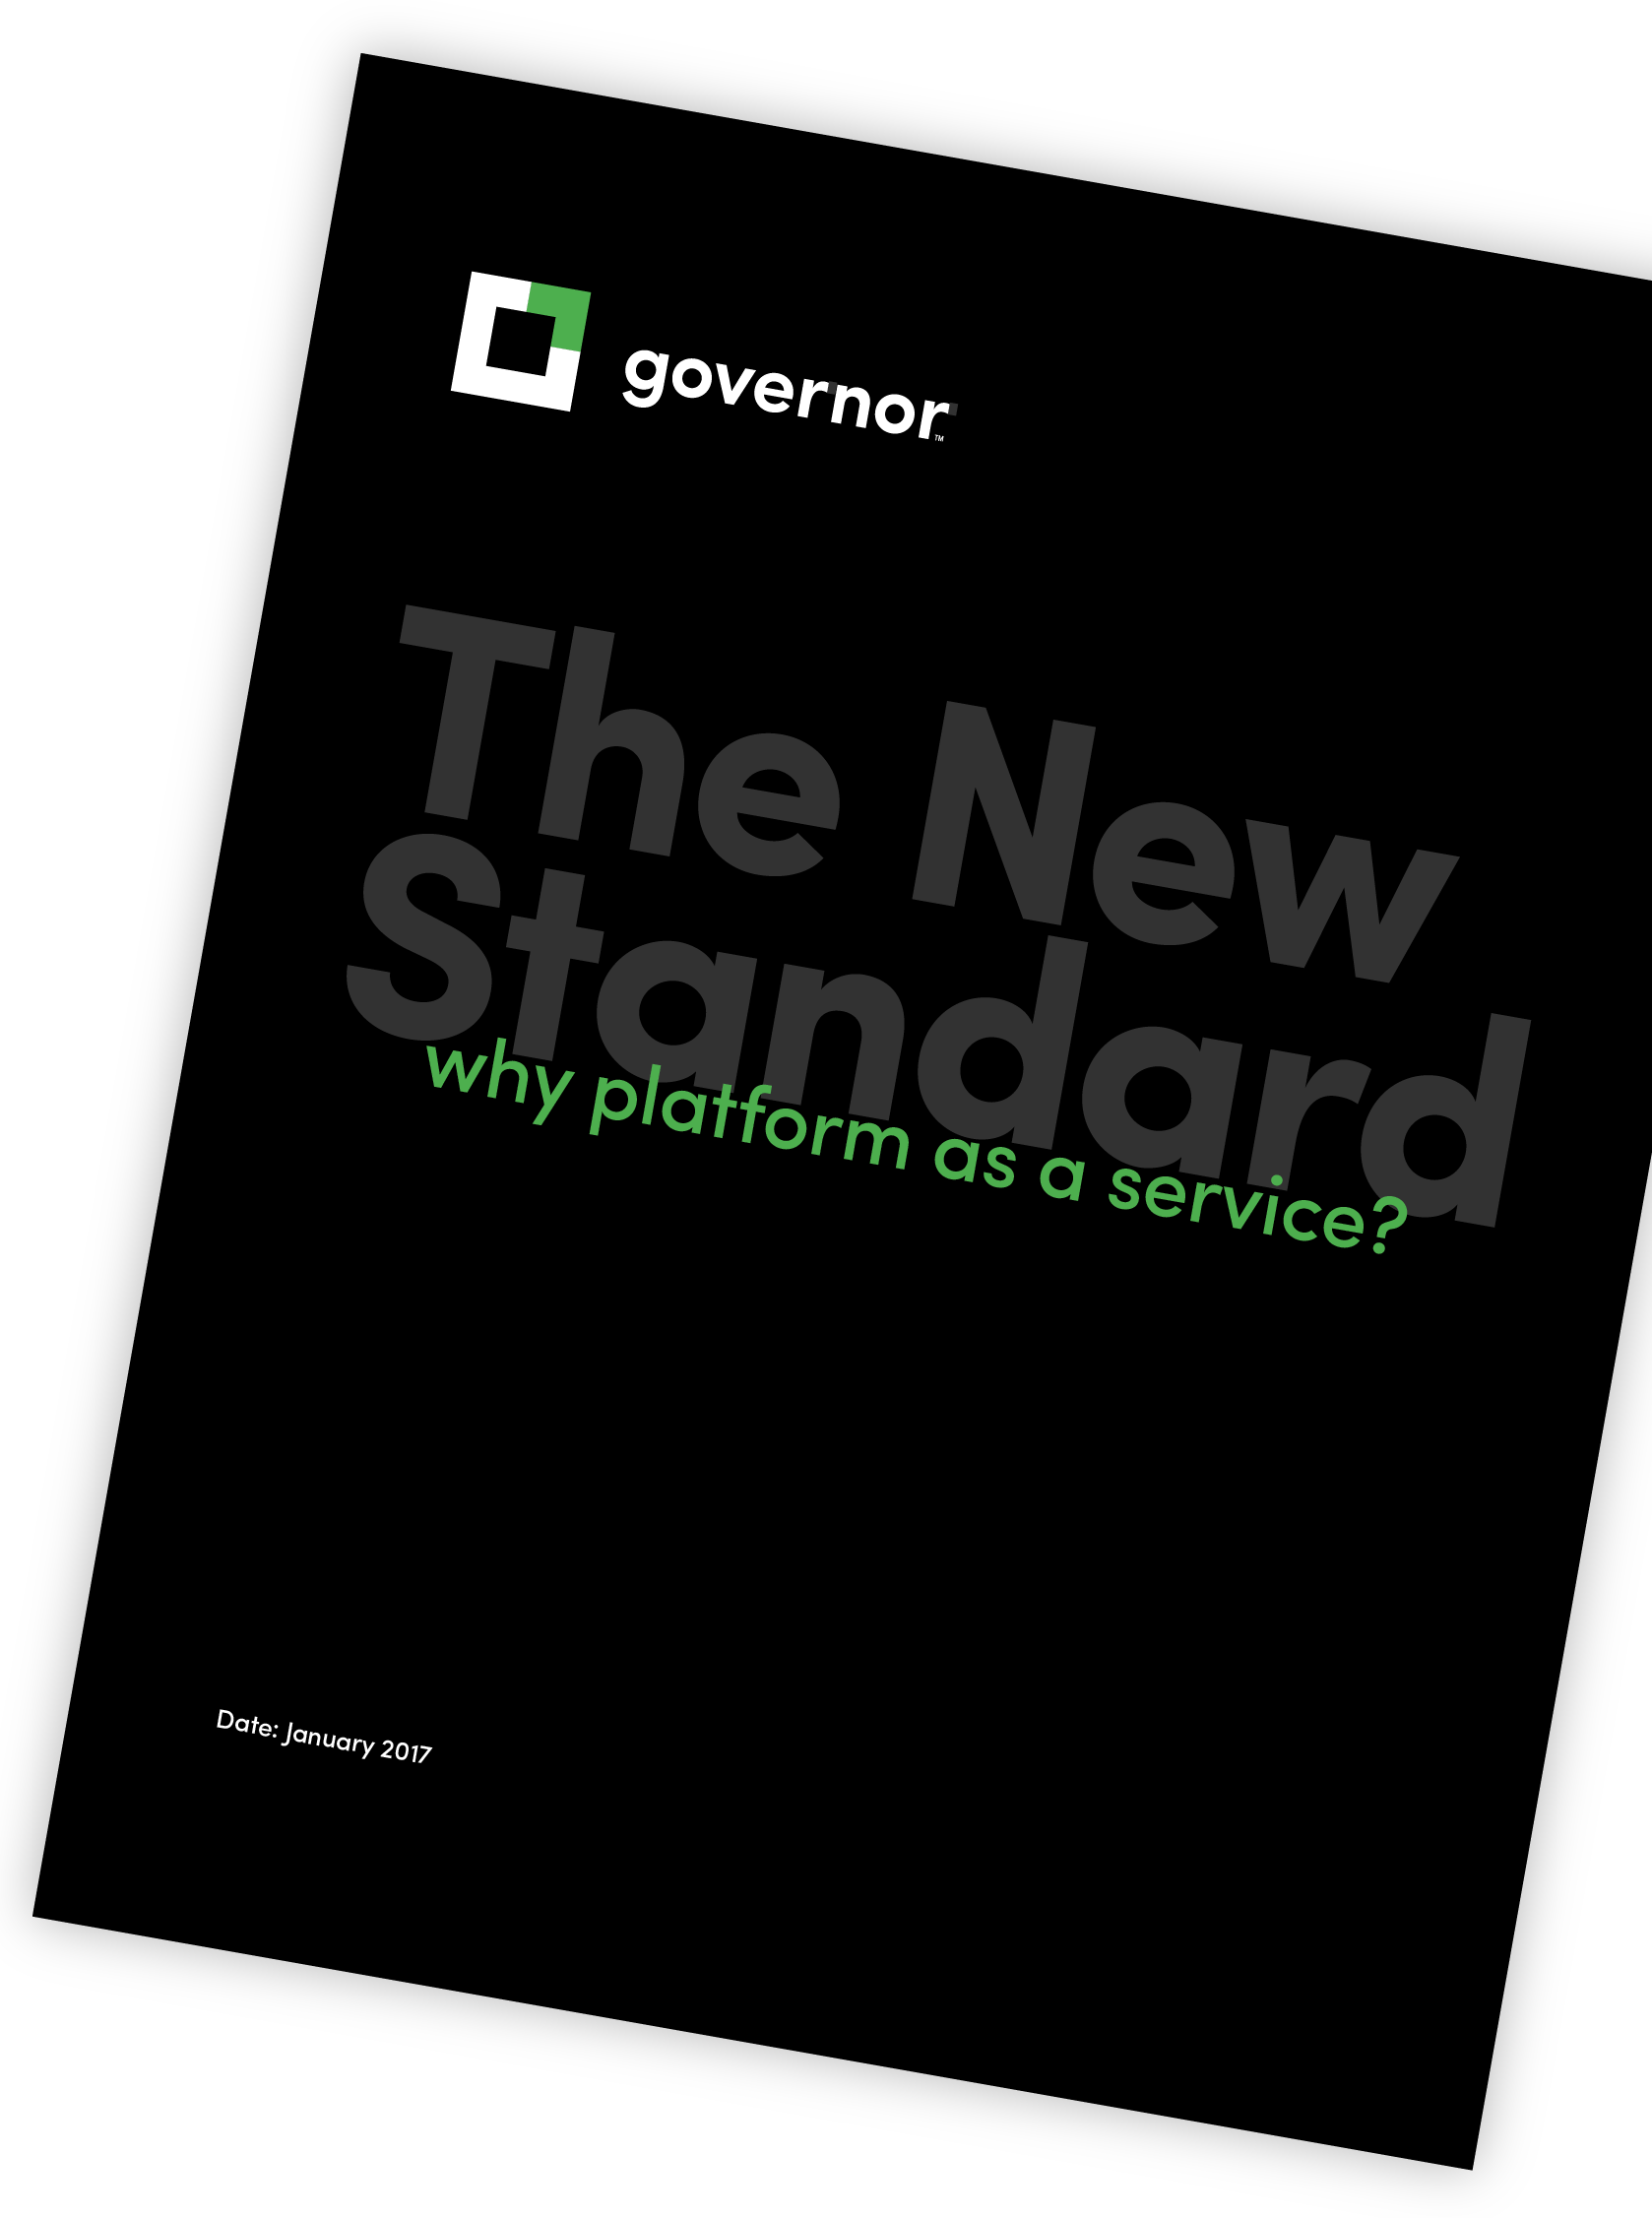 platform as a service document